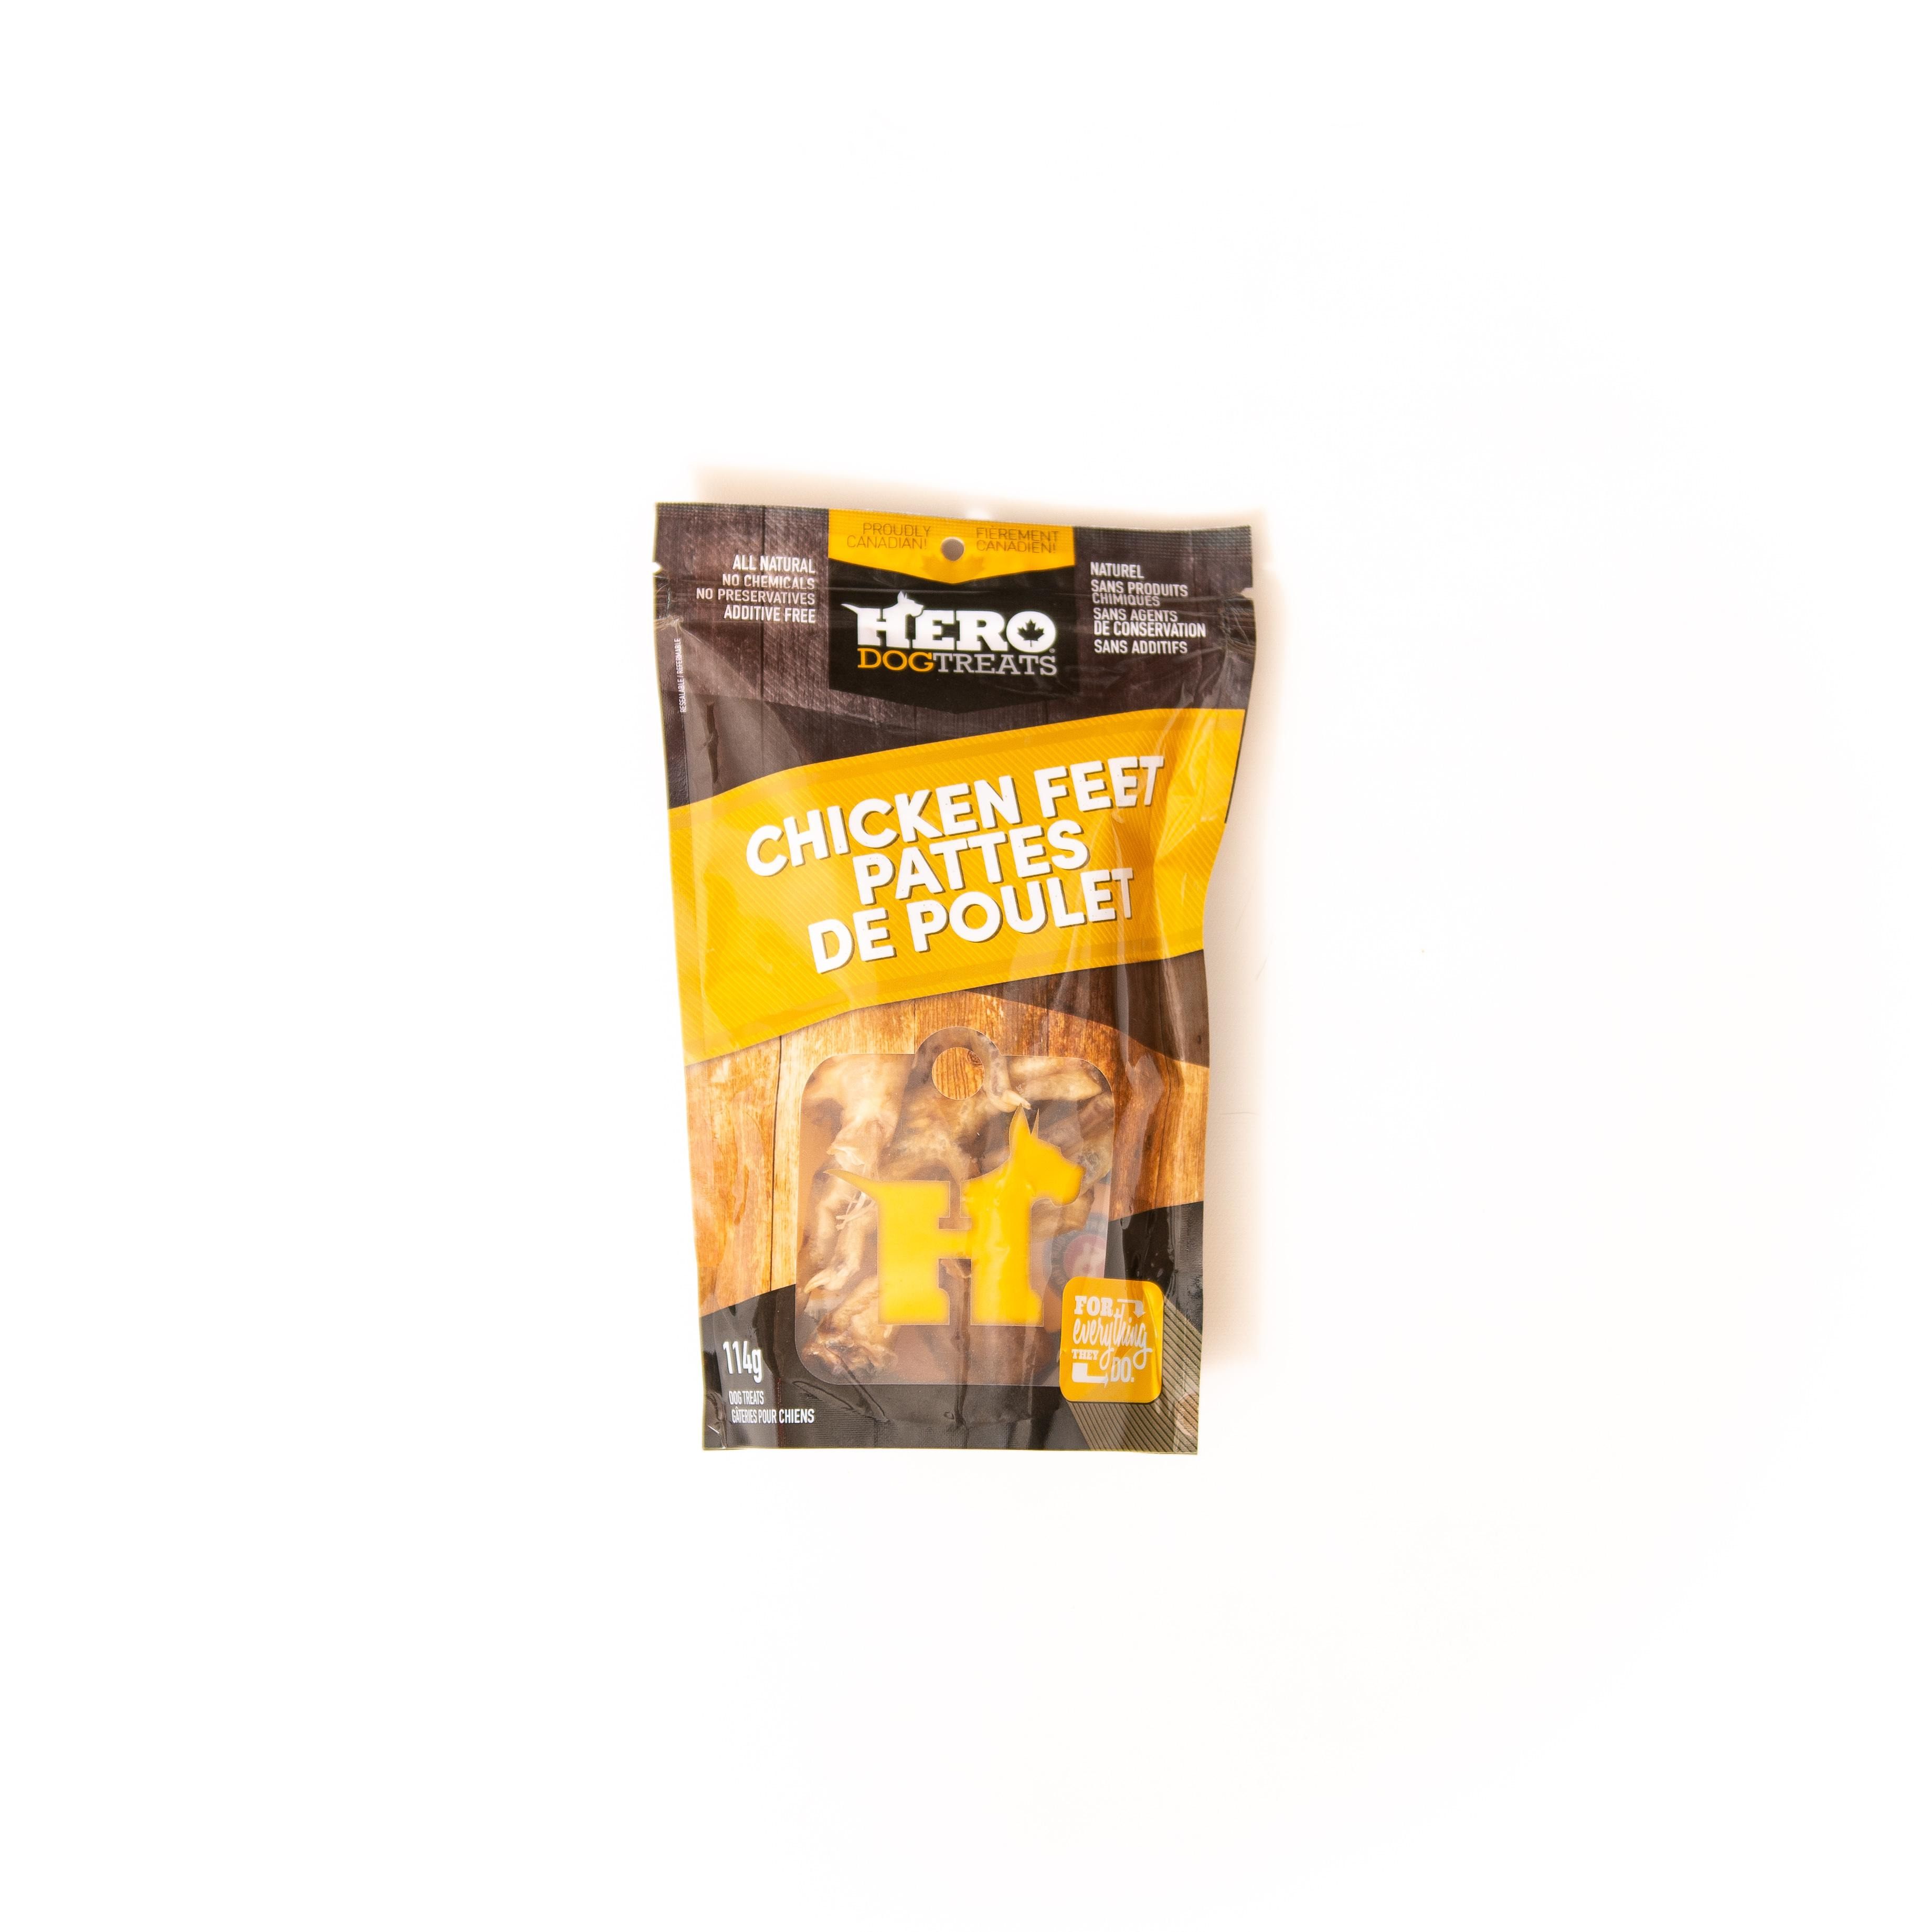 HeroDogTreats Chicken Feet Dog Treats, 114-gram